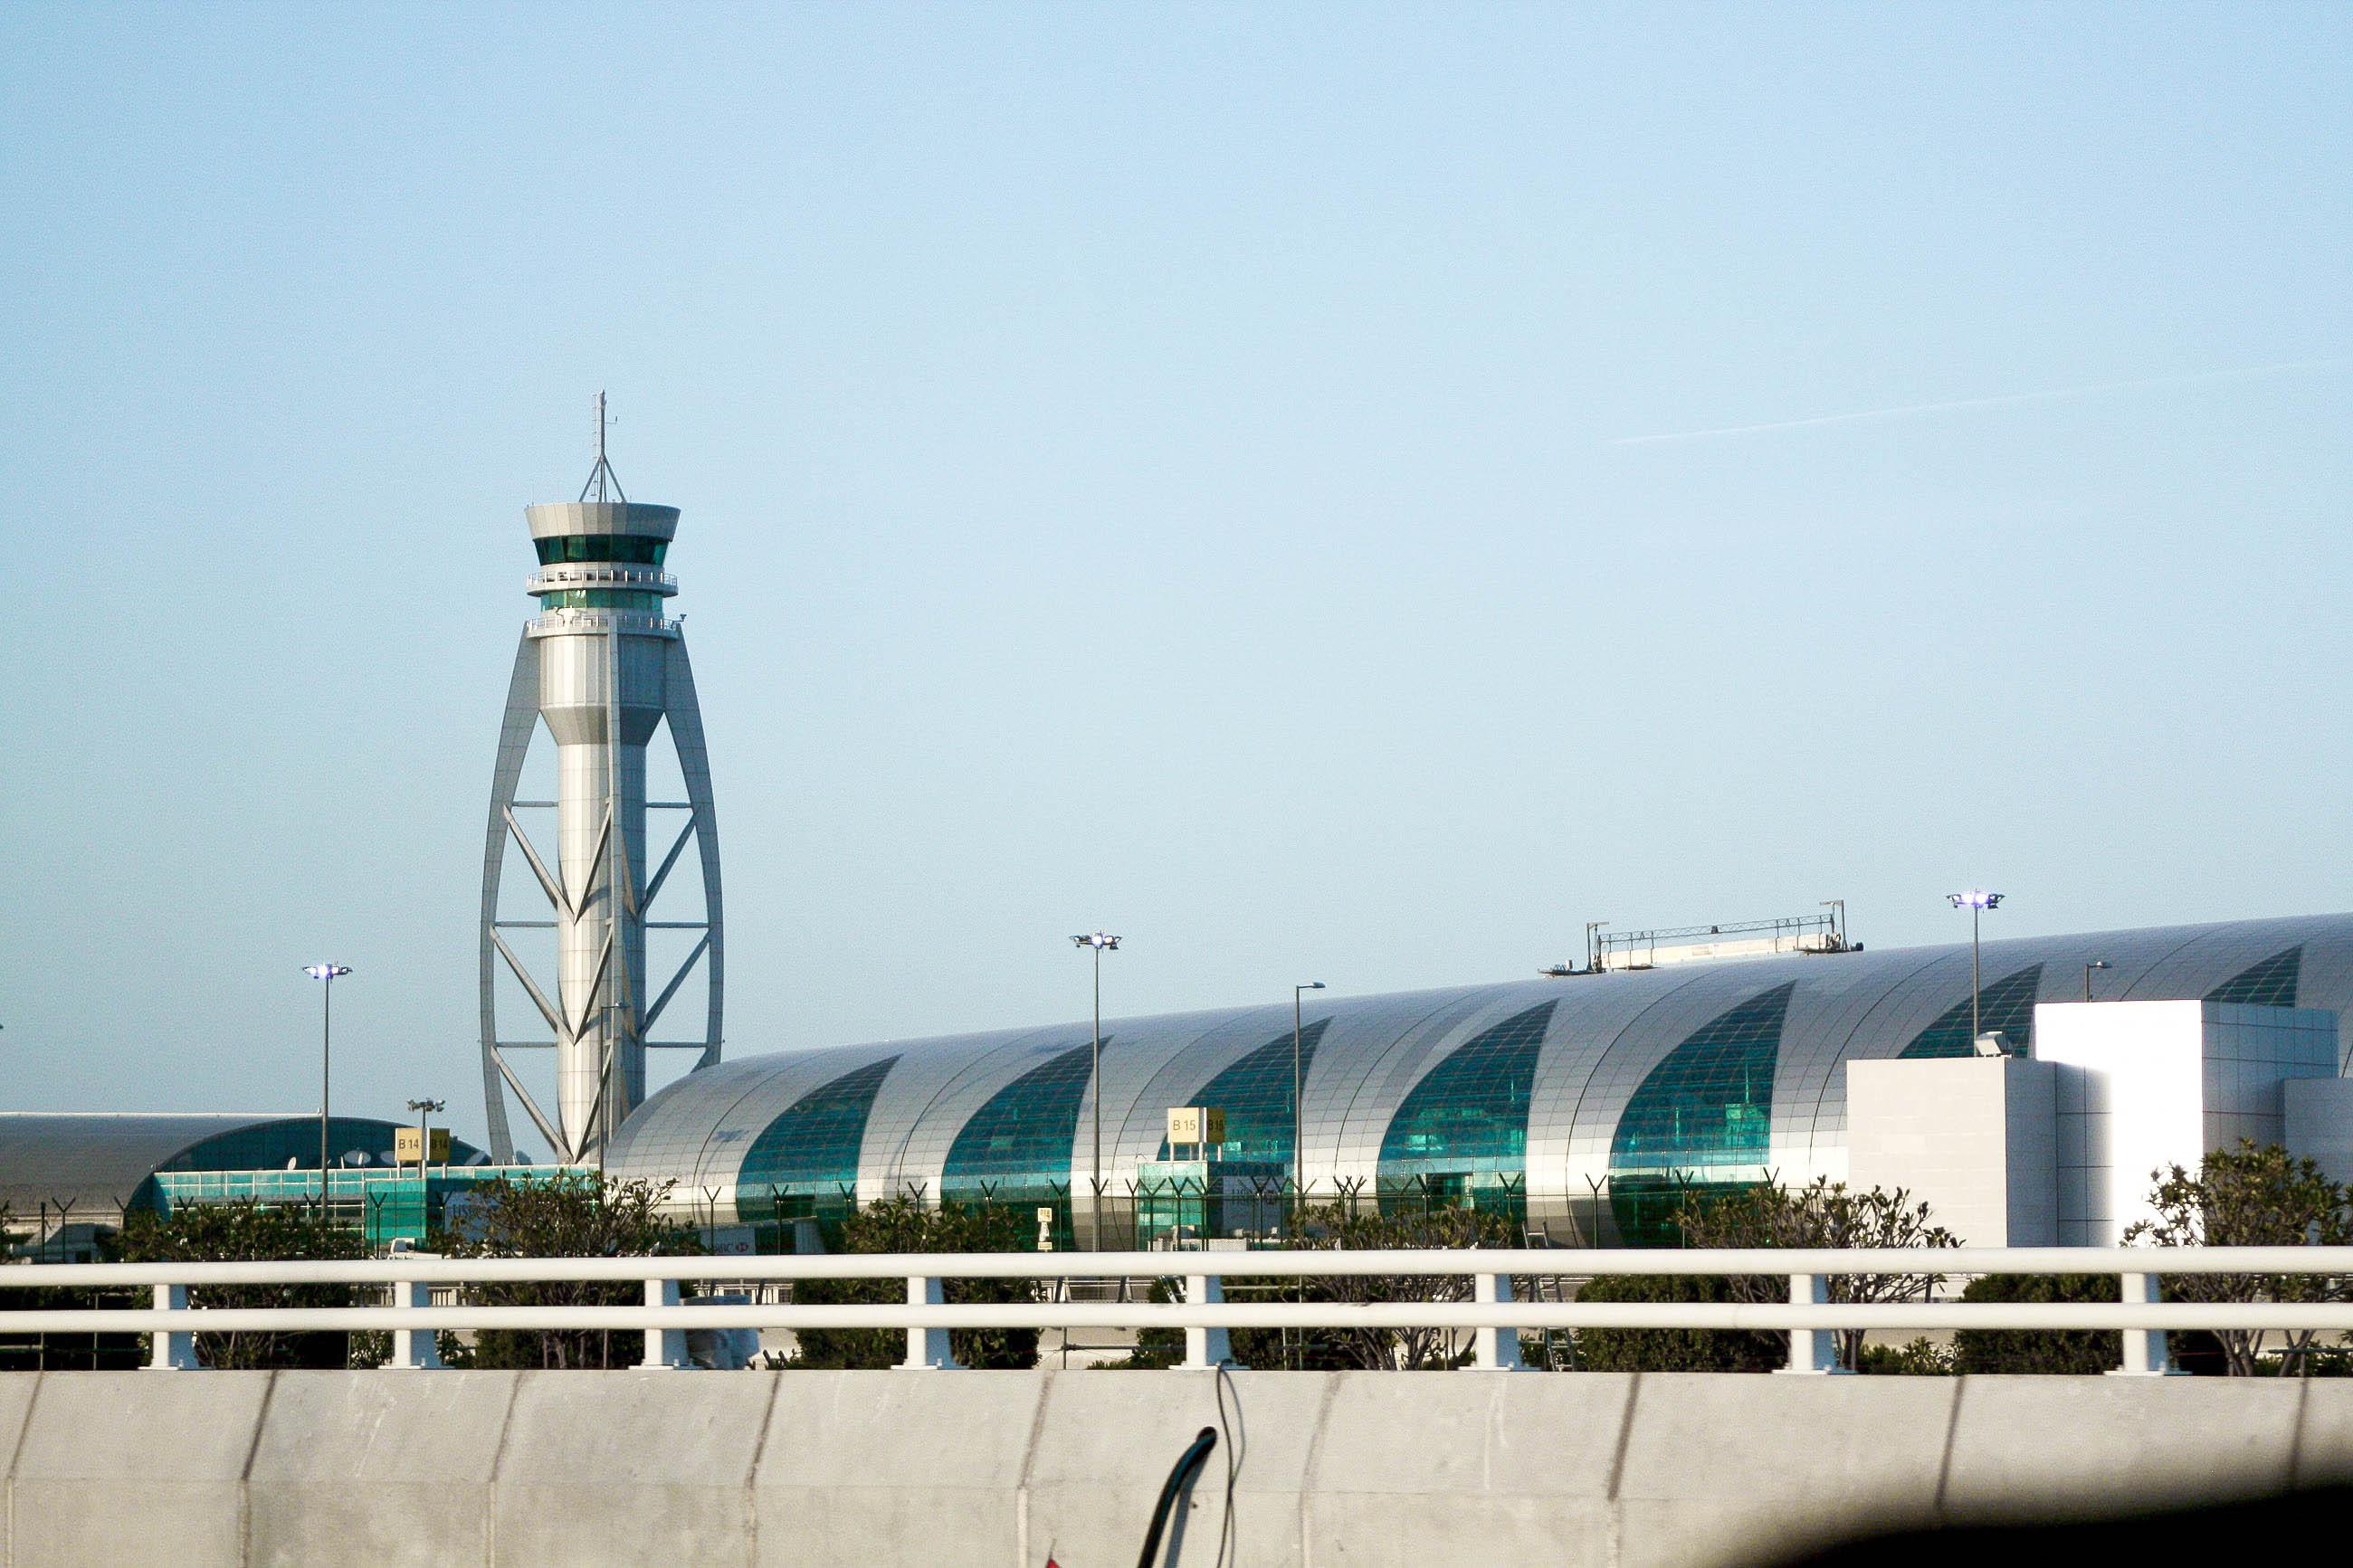 Dubai International Airport - Level of Service Assessment